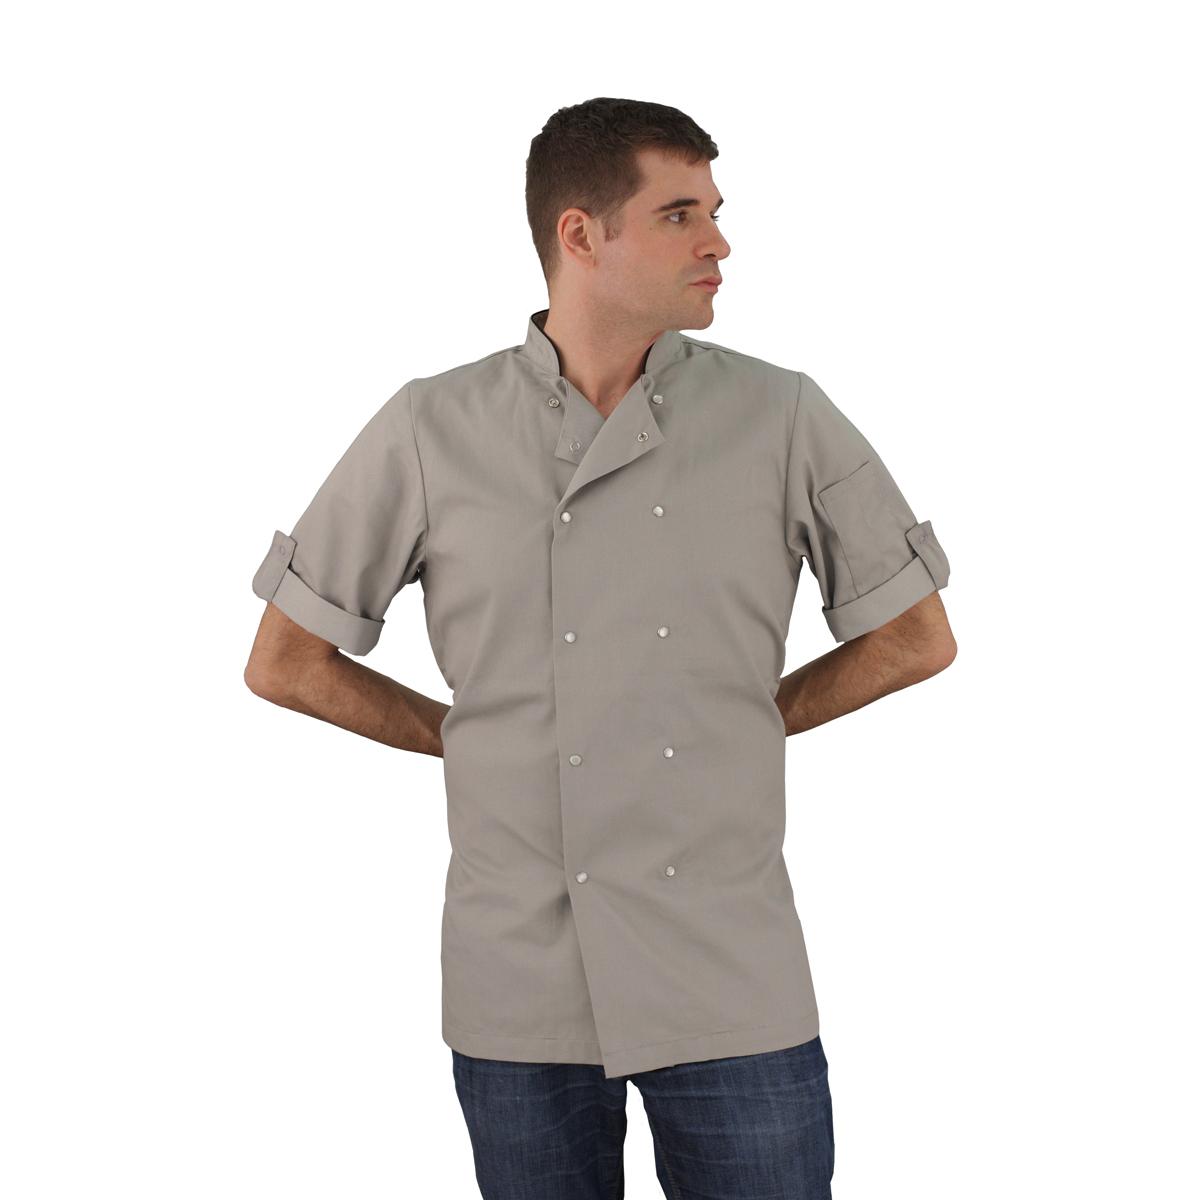 Stone Chef Coat Short Sleeve Unisex Art Style Design Living